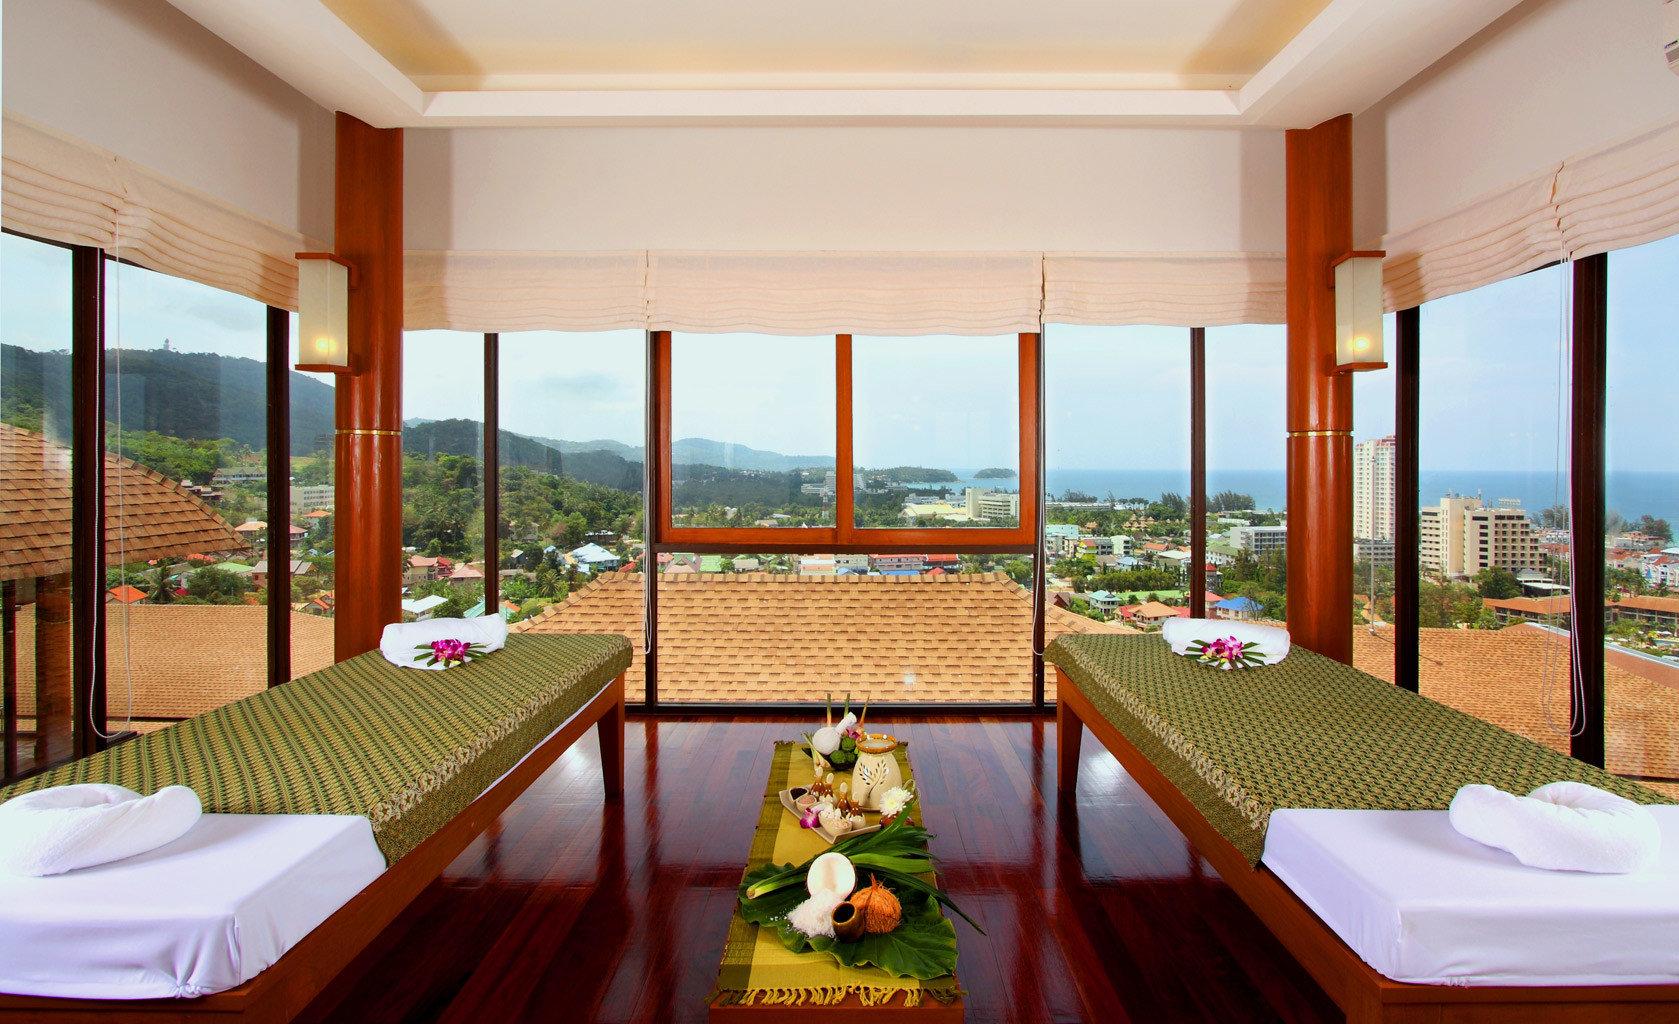 B&B Beachfront Spa Wellness chair property overlooking Resort Suite Villa condominium function hall nice Island